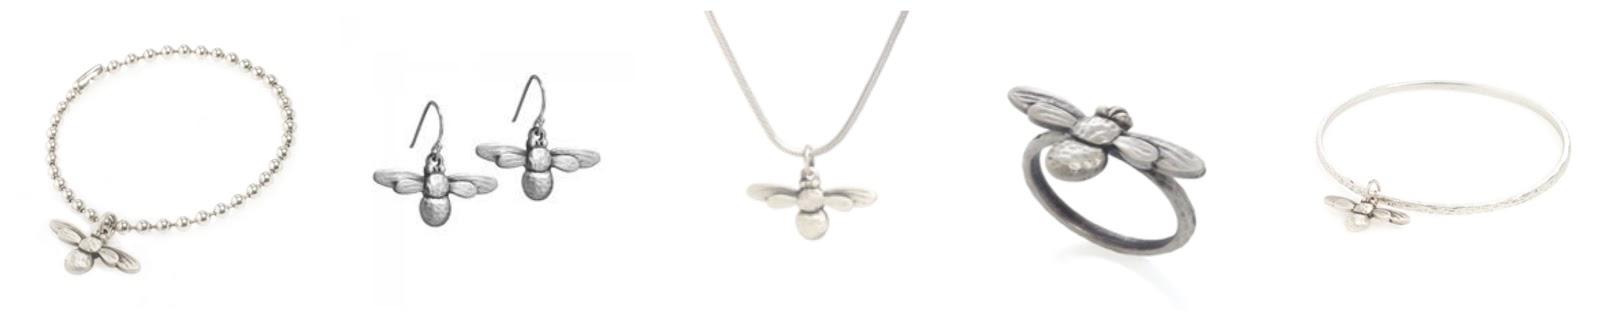 Danon silver honey bee necklace bracelet ring earrings bangle